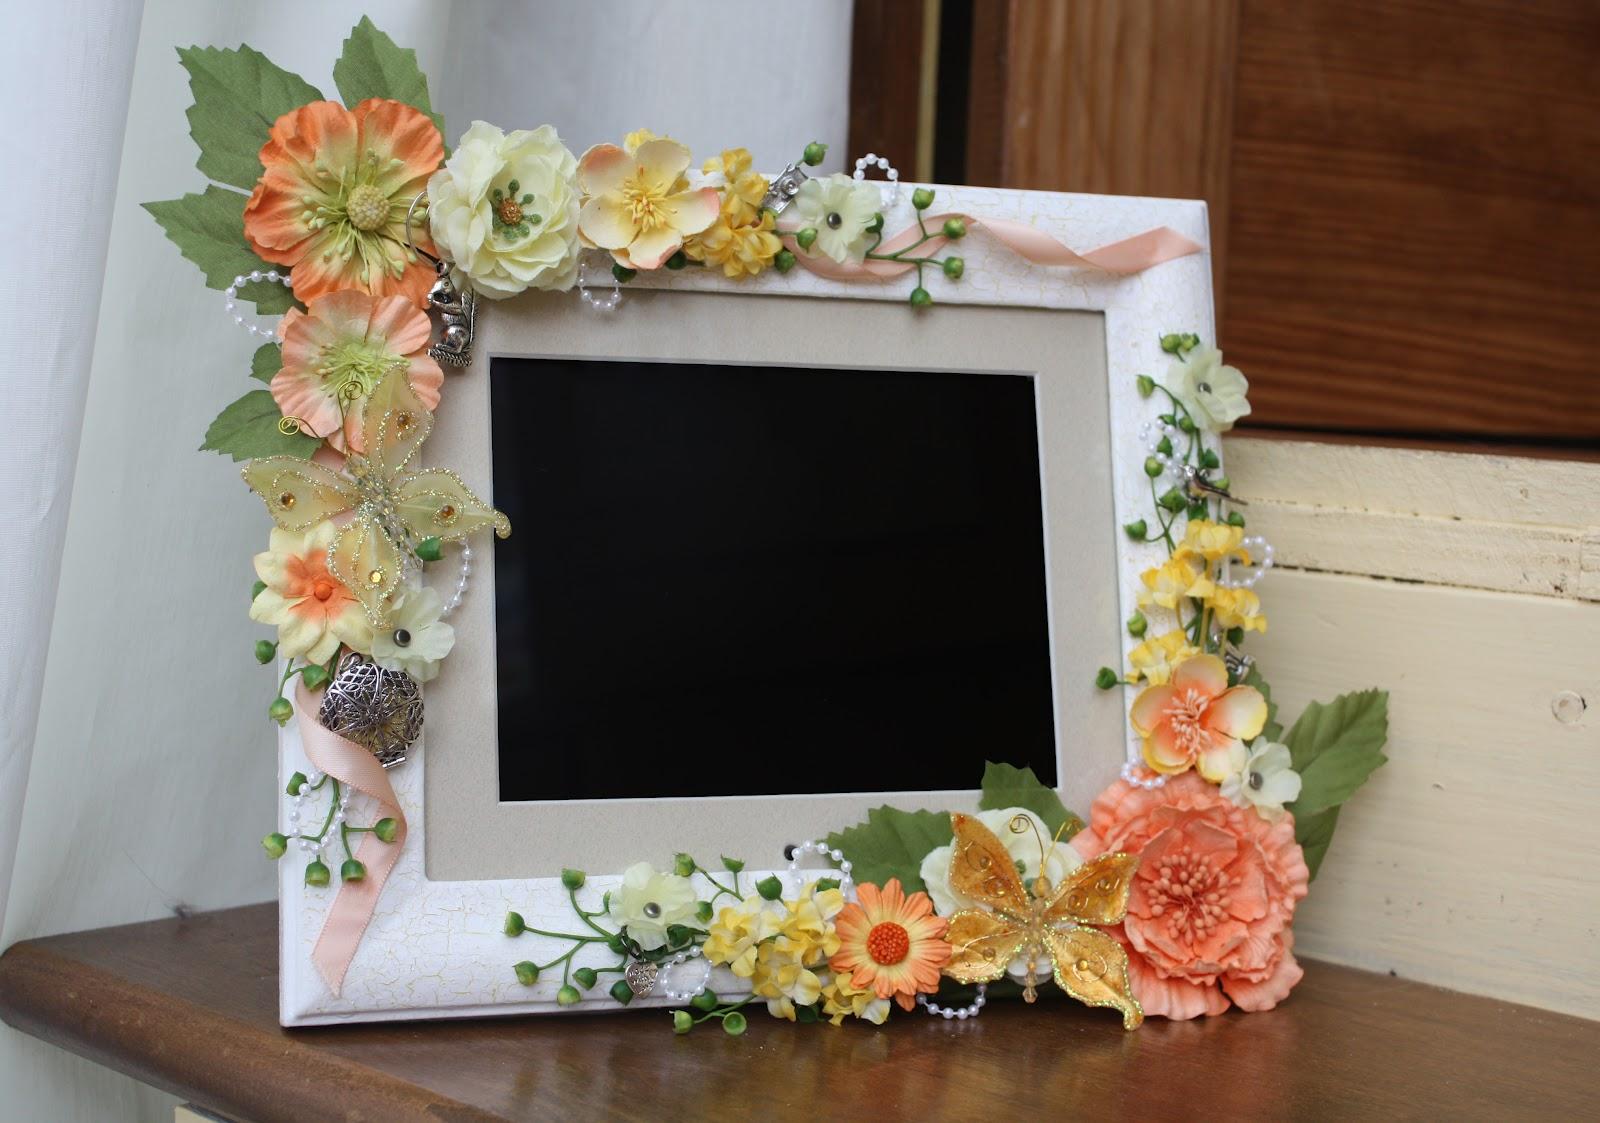 my fmil began decorating her digital photo frame it was so beautiful